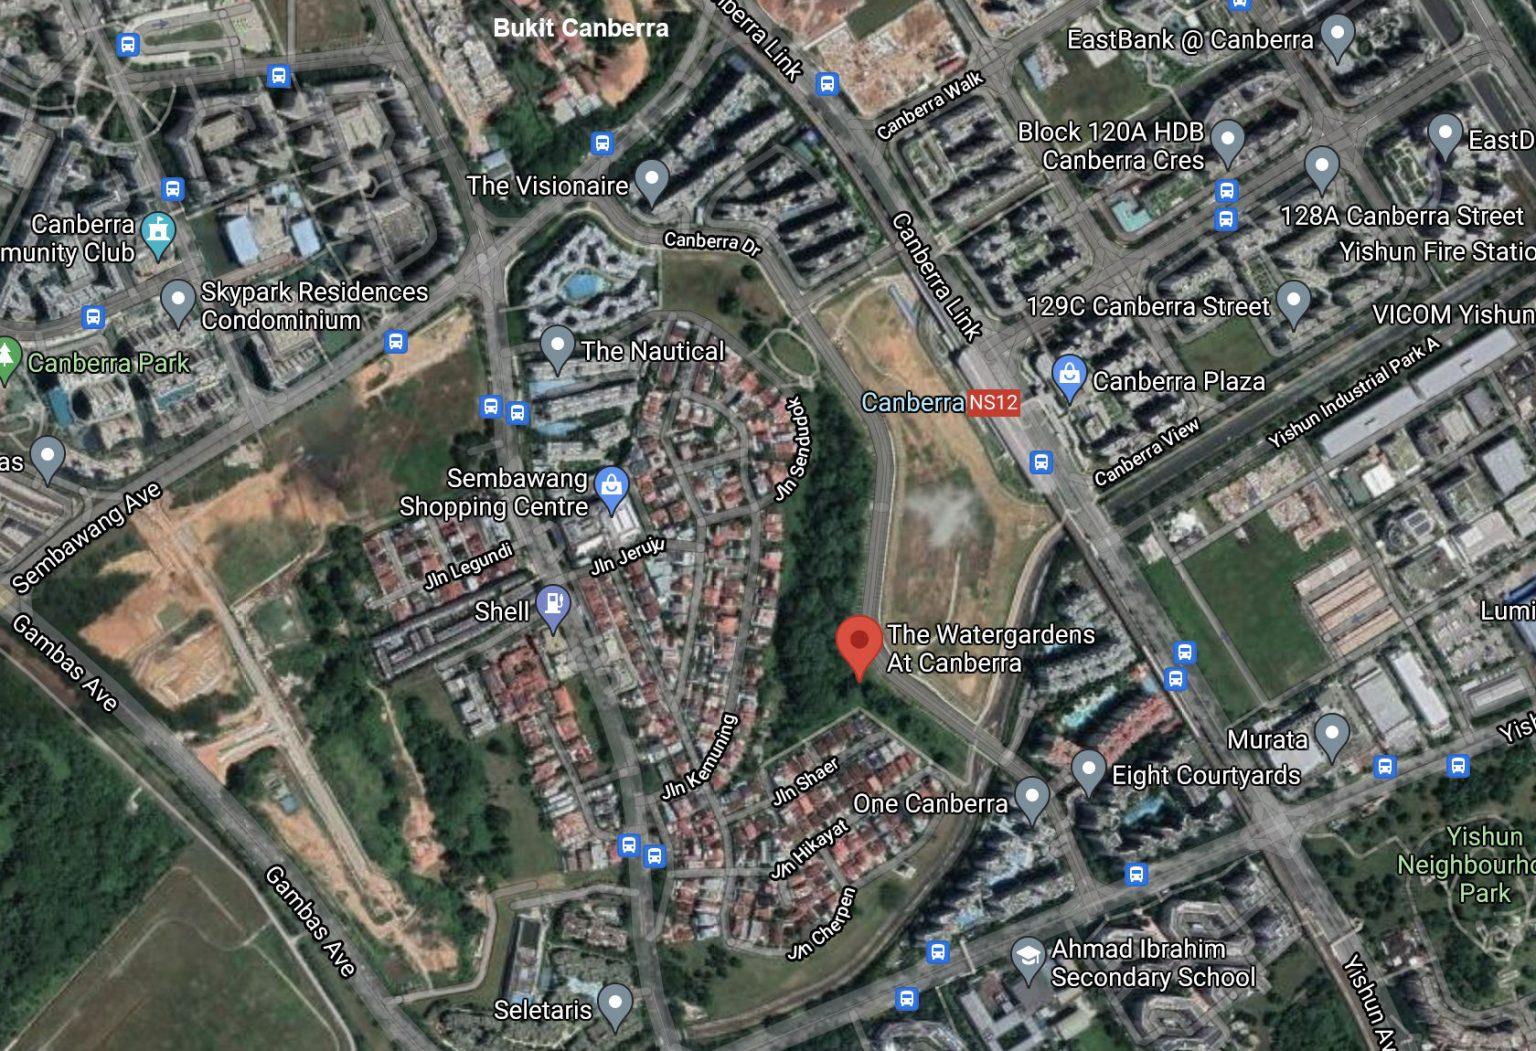 The-Watergardens-Location-Map-of-Neighbourhood